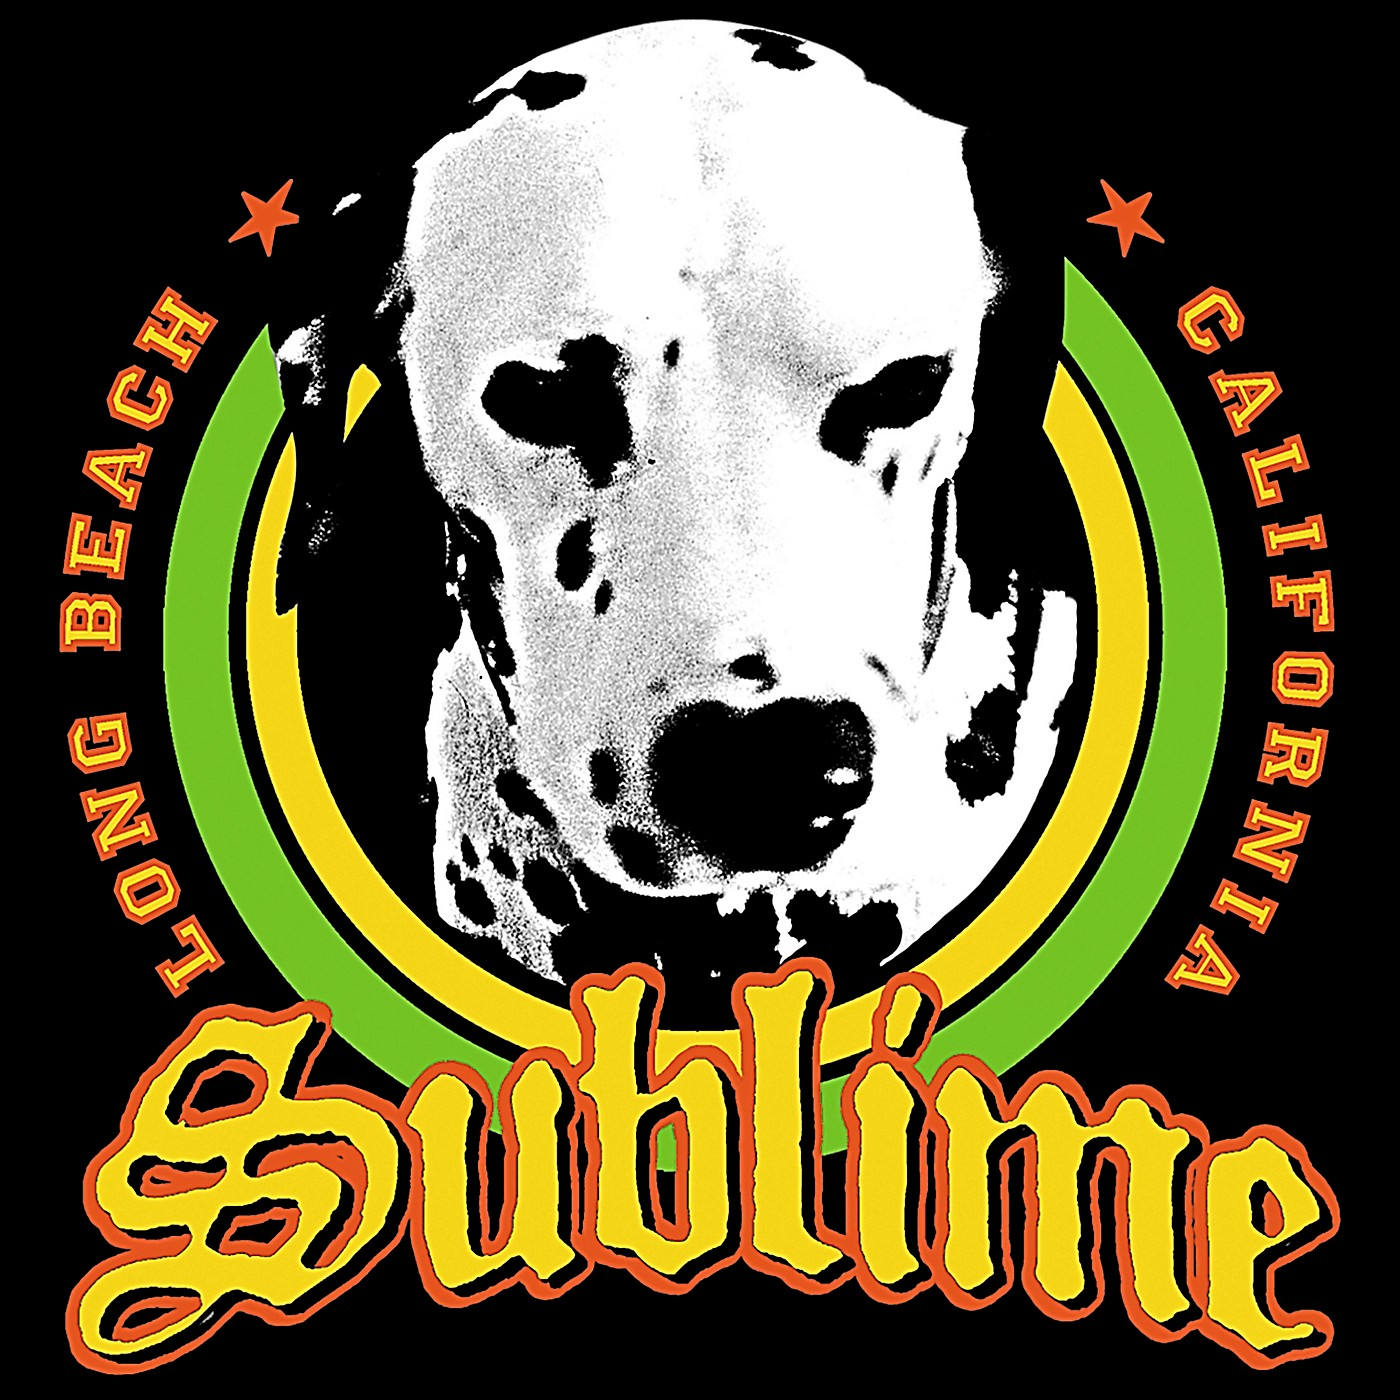 C&D Visionary Sublime Lou Dog Sticker thumbnail